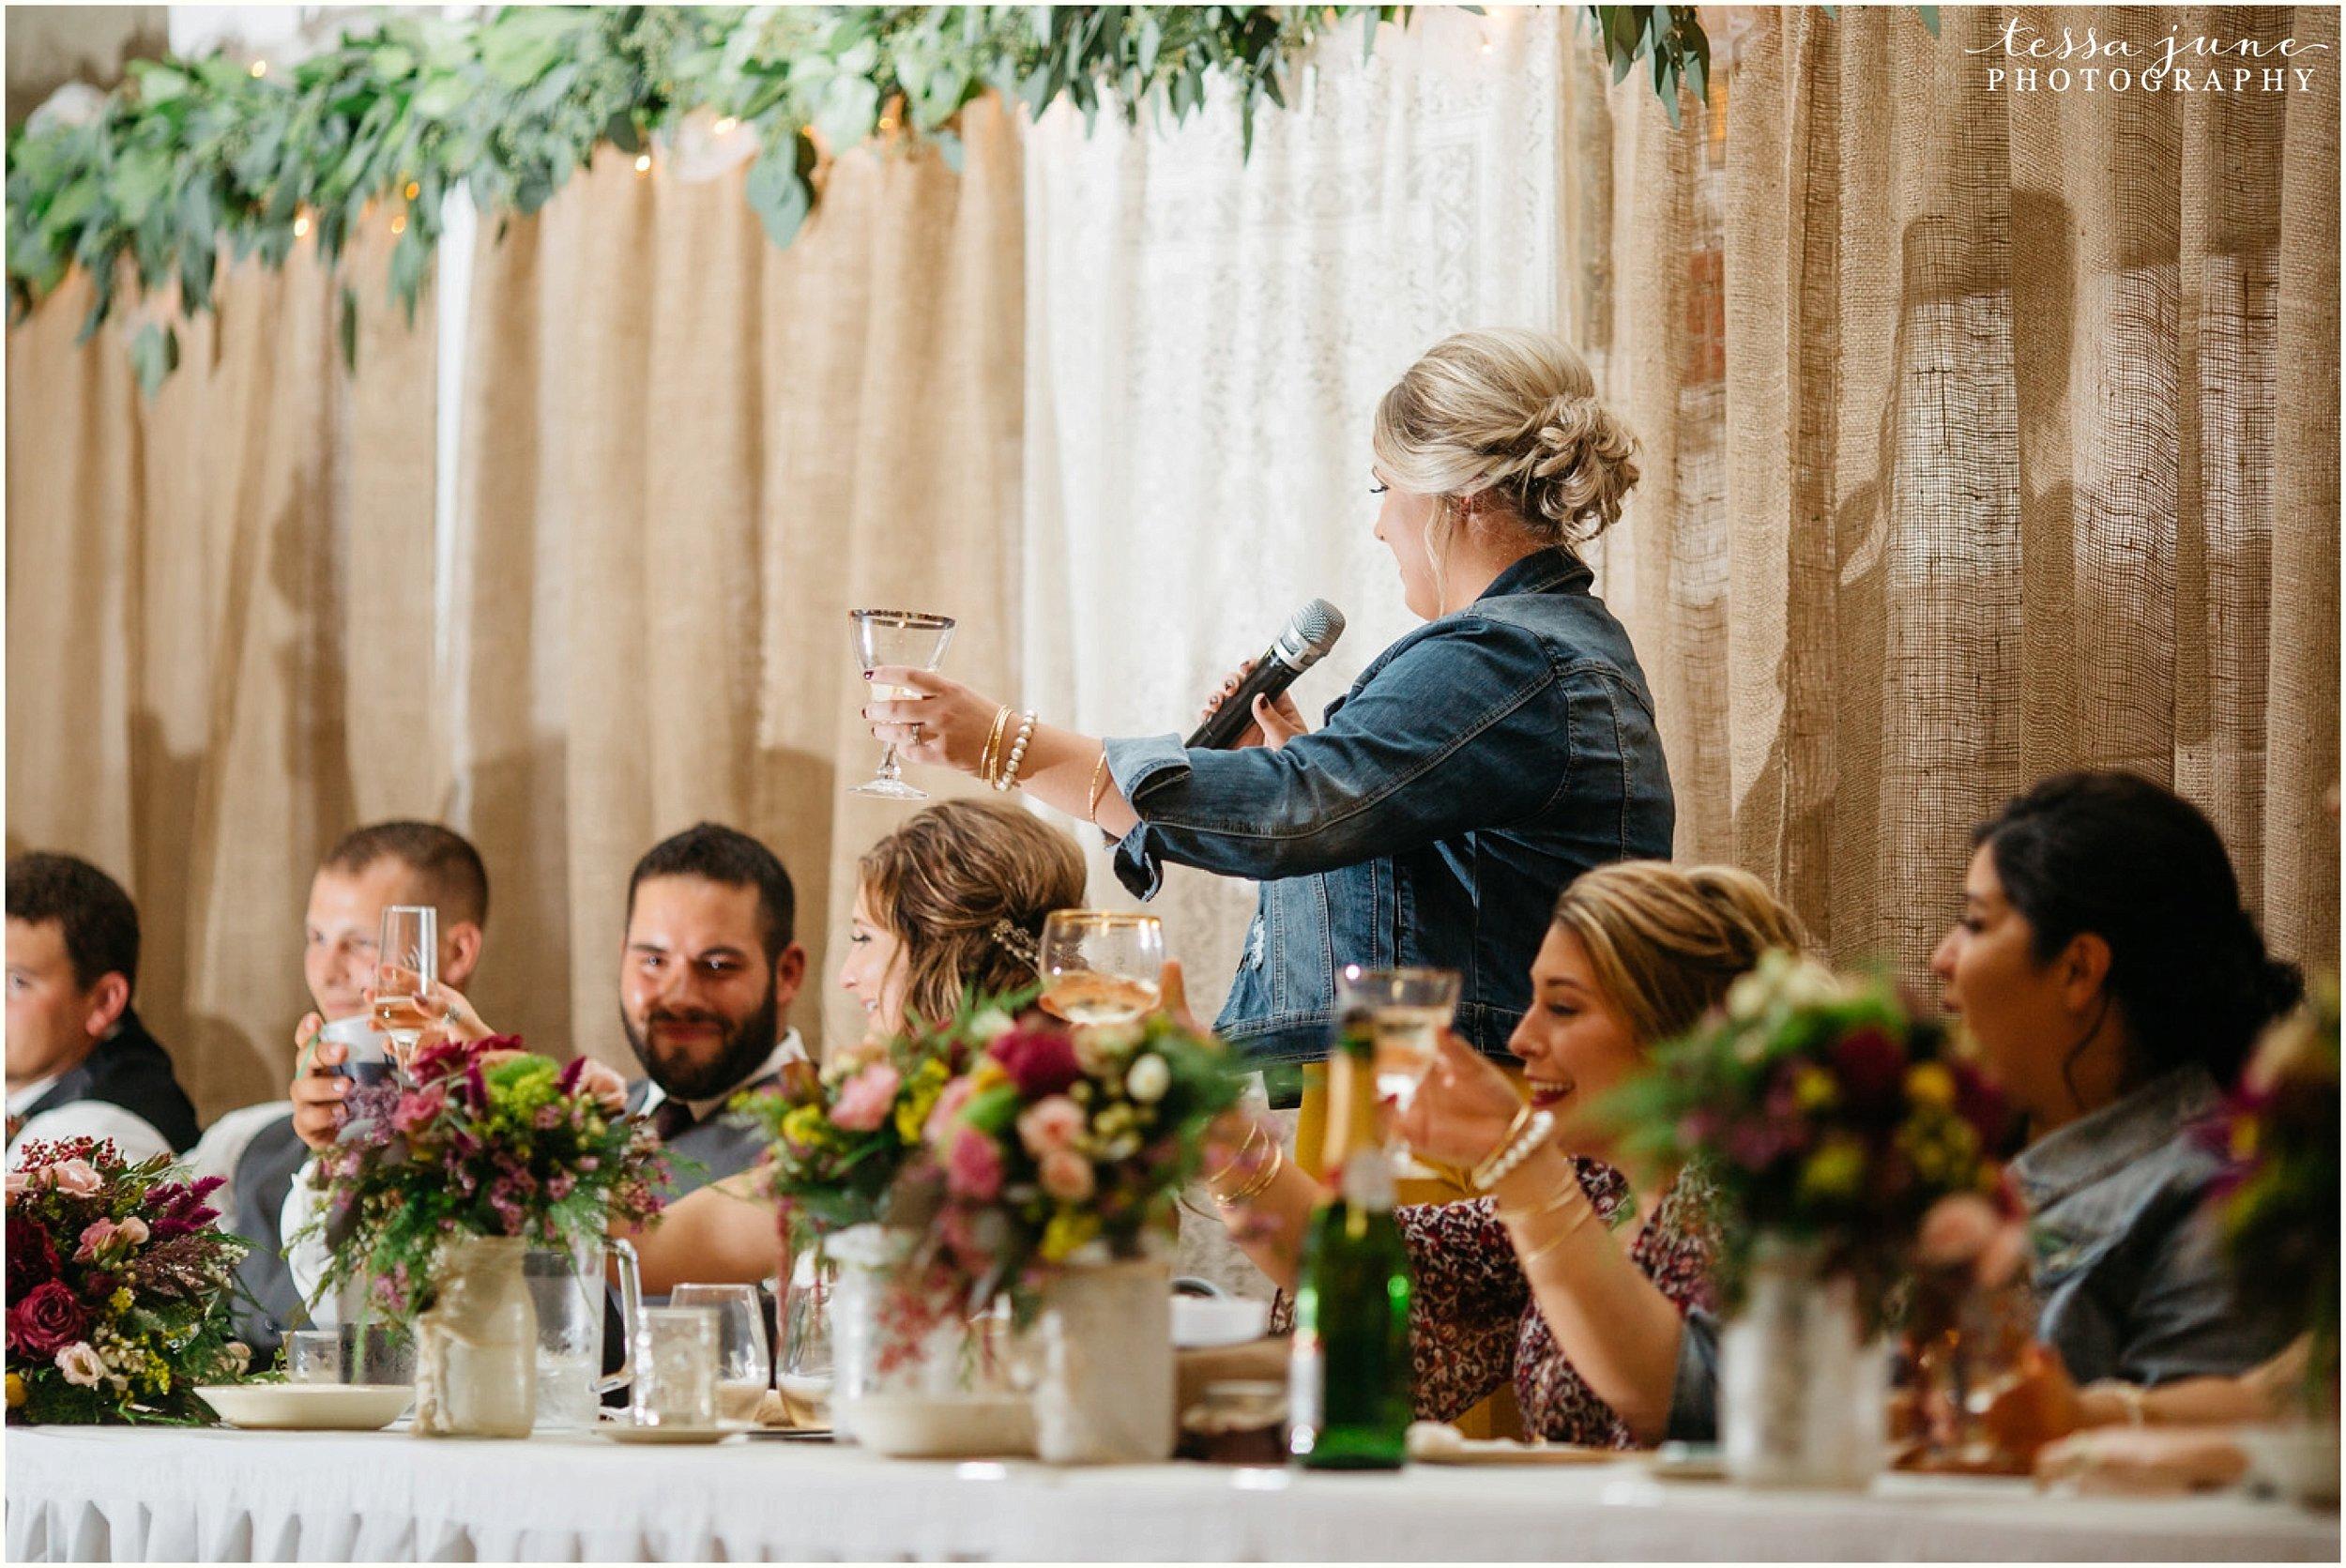 bohemian-minnesota-wedding-mismatched-bridesmaid-dresses-waterfall-st-cloud-tessa-june-photography-175.jpg